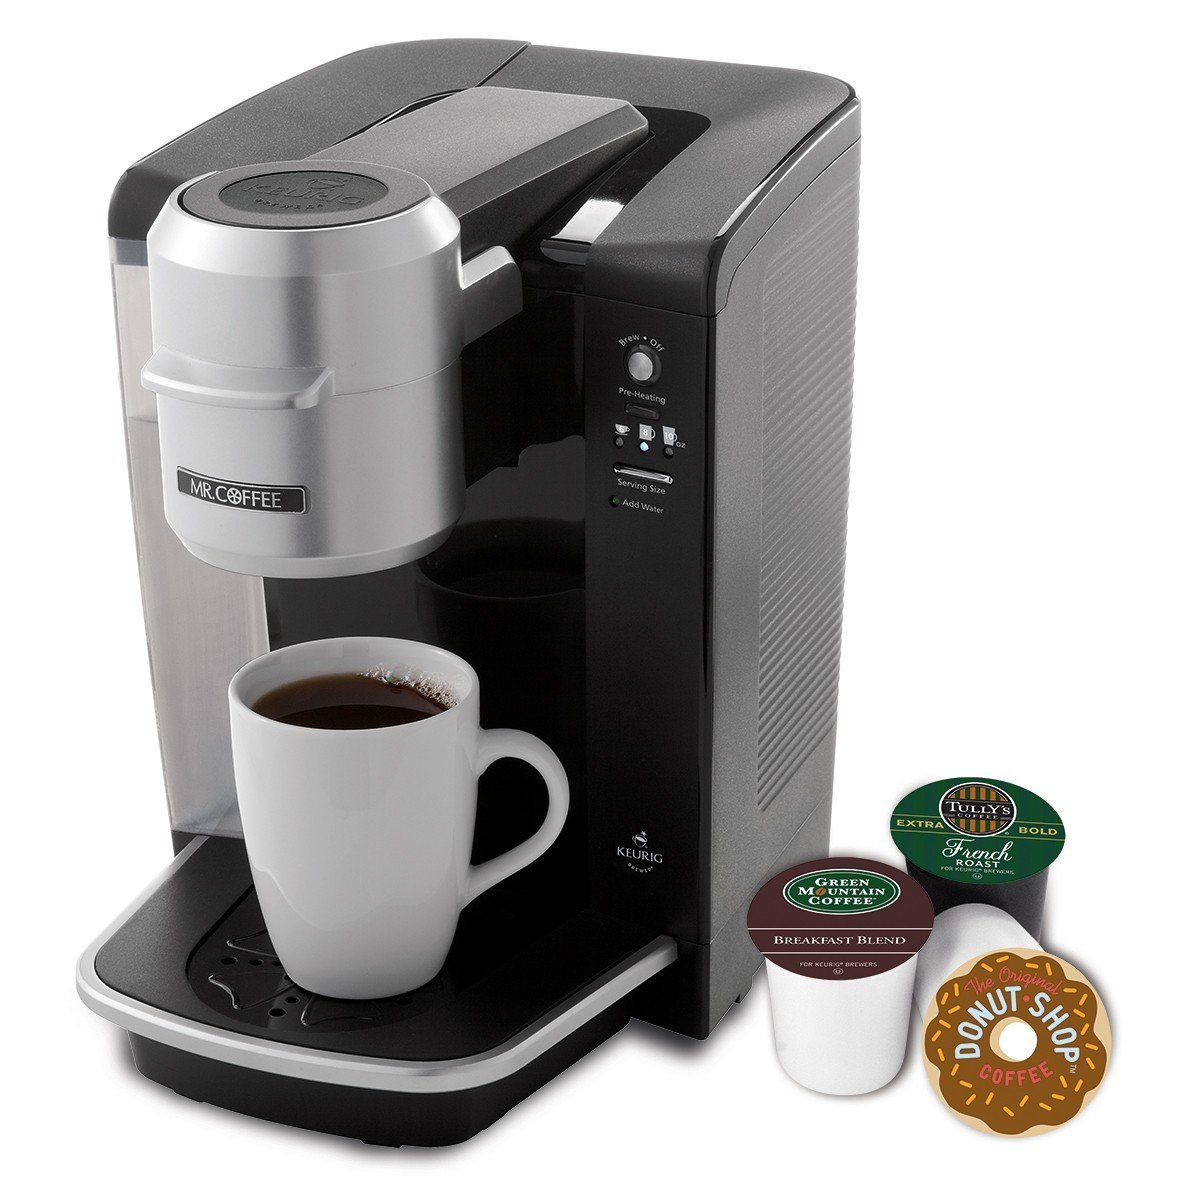 Mr. Coffee Single Serve Coffee Brewer BVMC-KG6-001, 40-Ounce, Black [並行輸入品] B0151STSHG